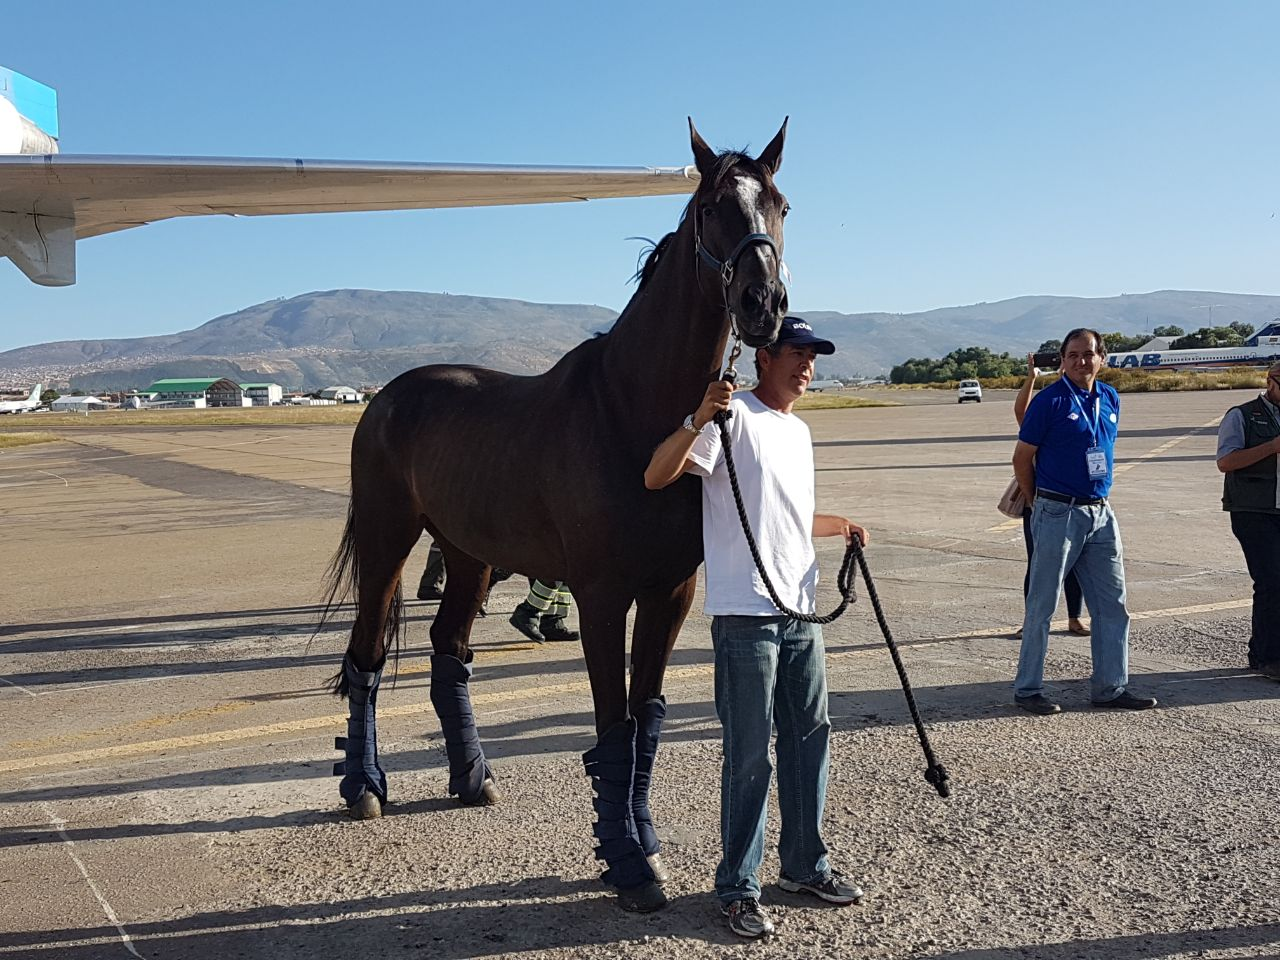 Arriban el primer Jinete y Caballo a Cochabamba